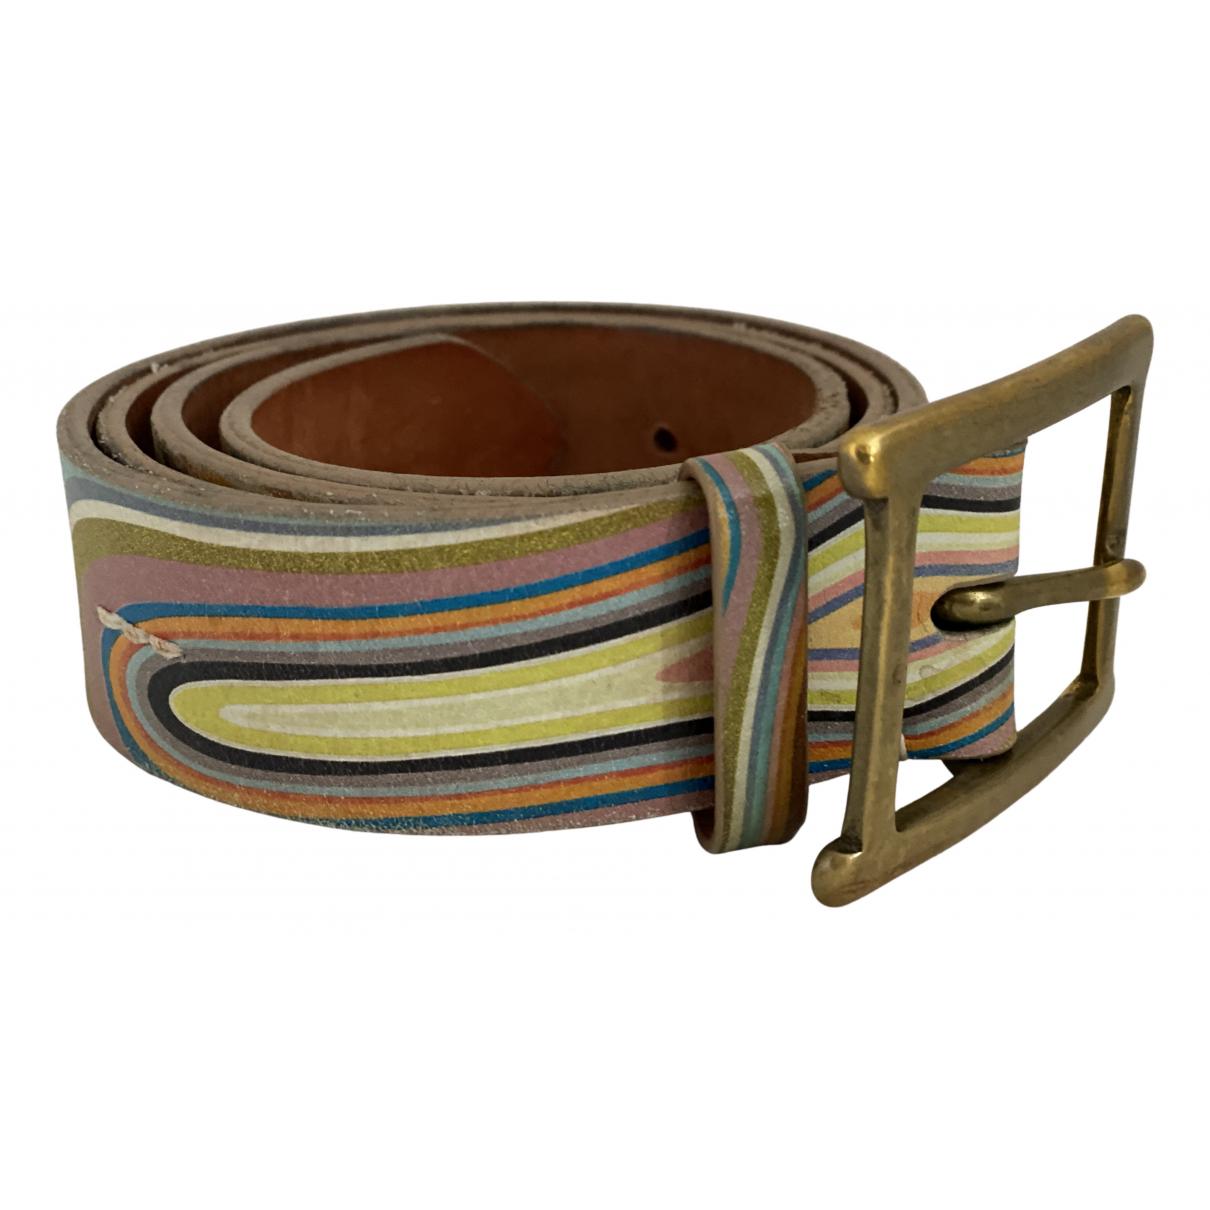 Cinturon Paul Smith